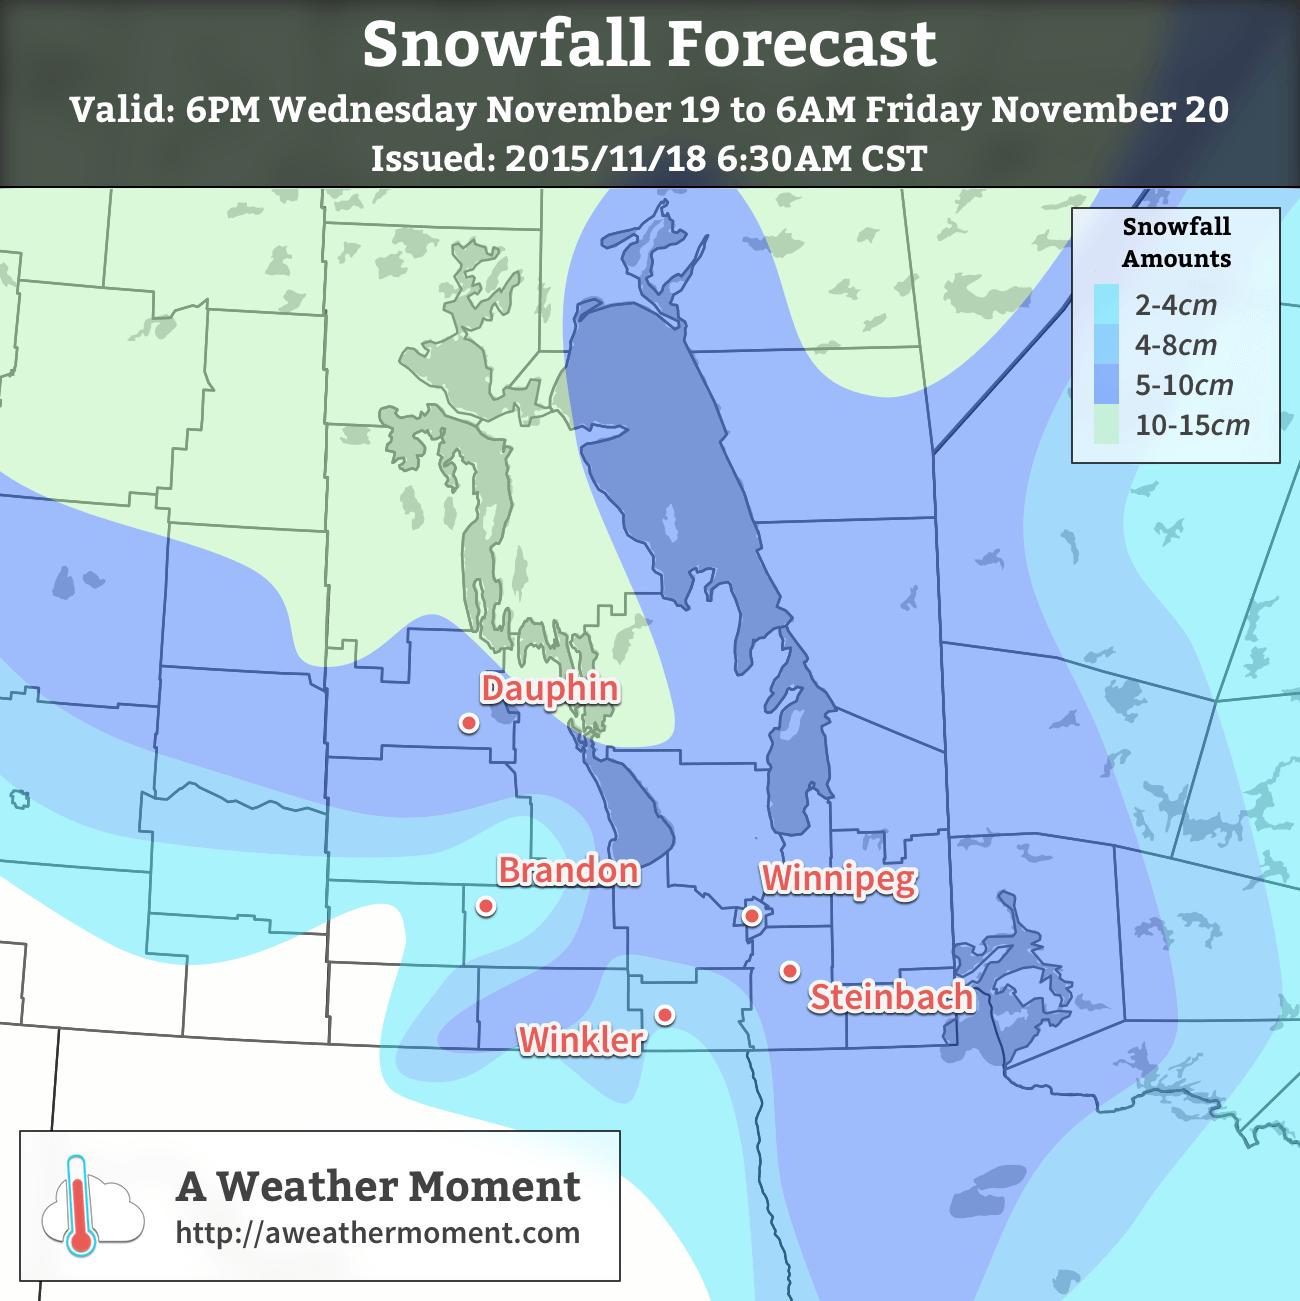 AWM Snowfall Forecast issued November 18, 2015